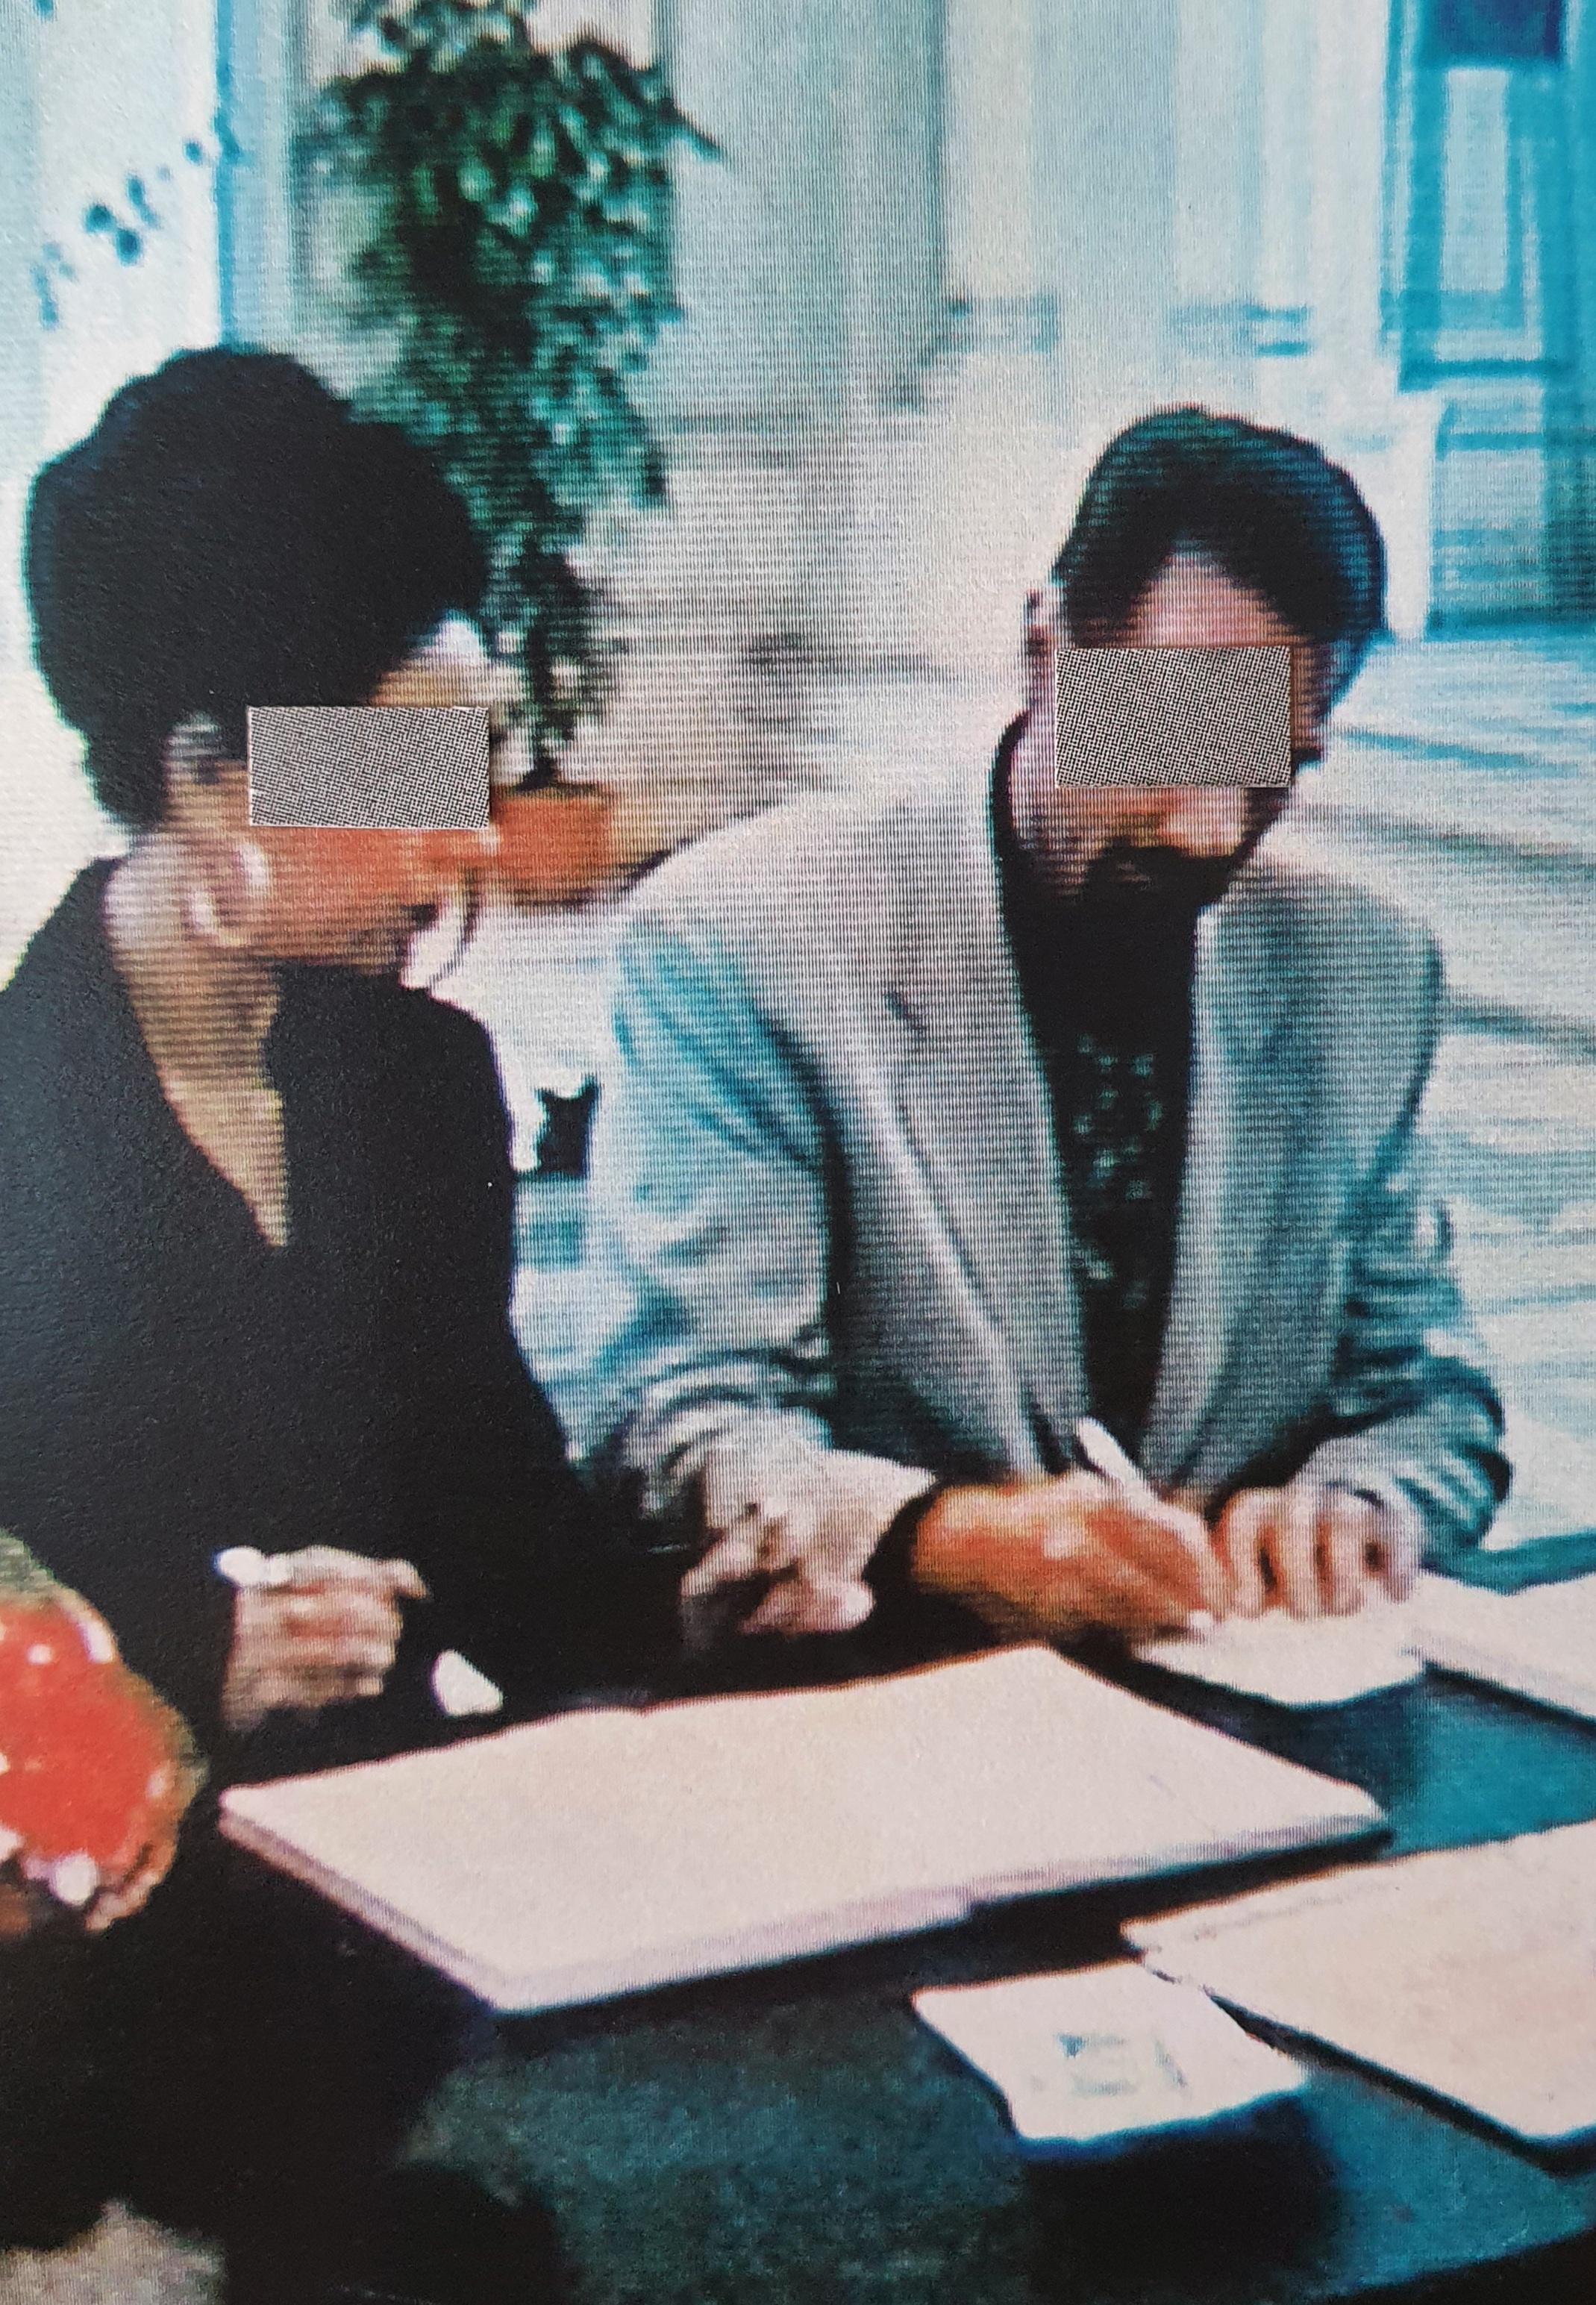 Rumanien partnervermittlung antoinette